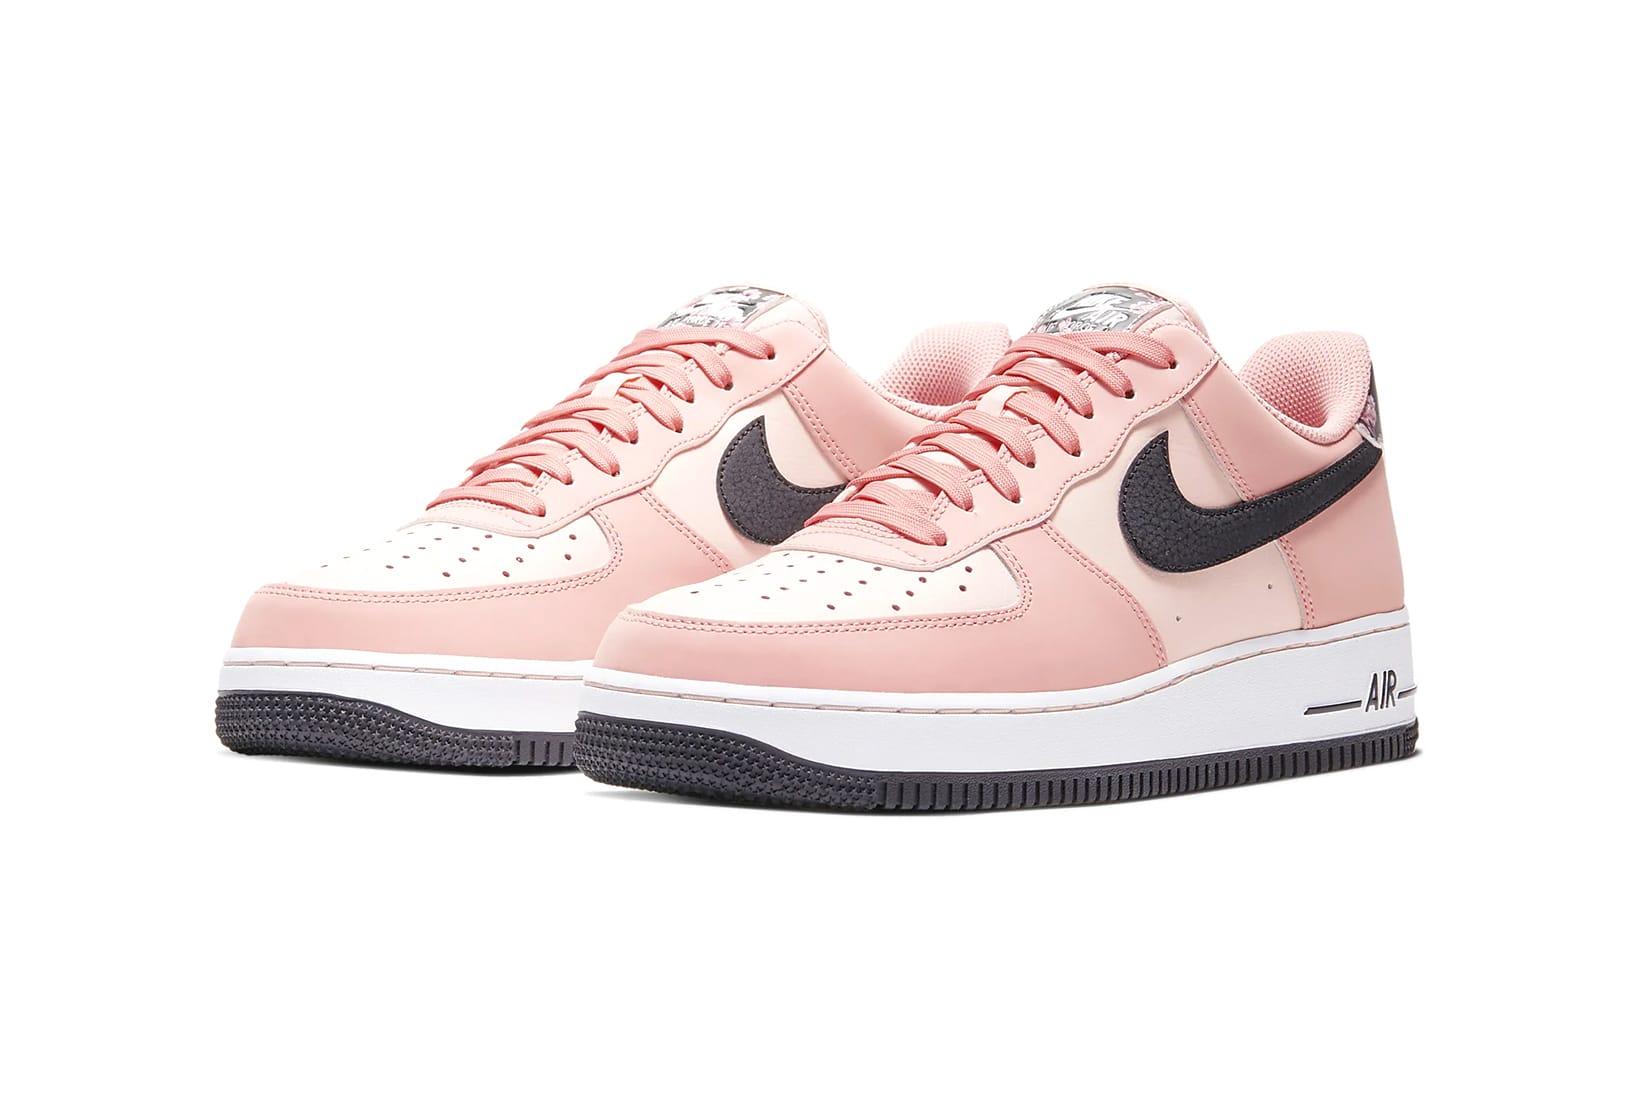 Nike Air Force 1 '07 in \